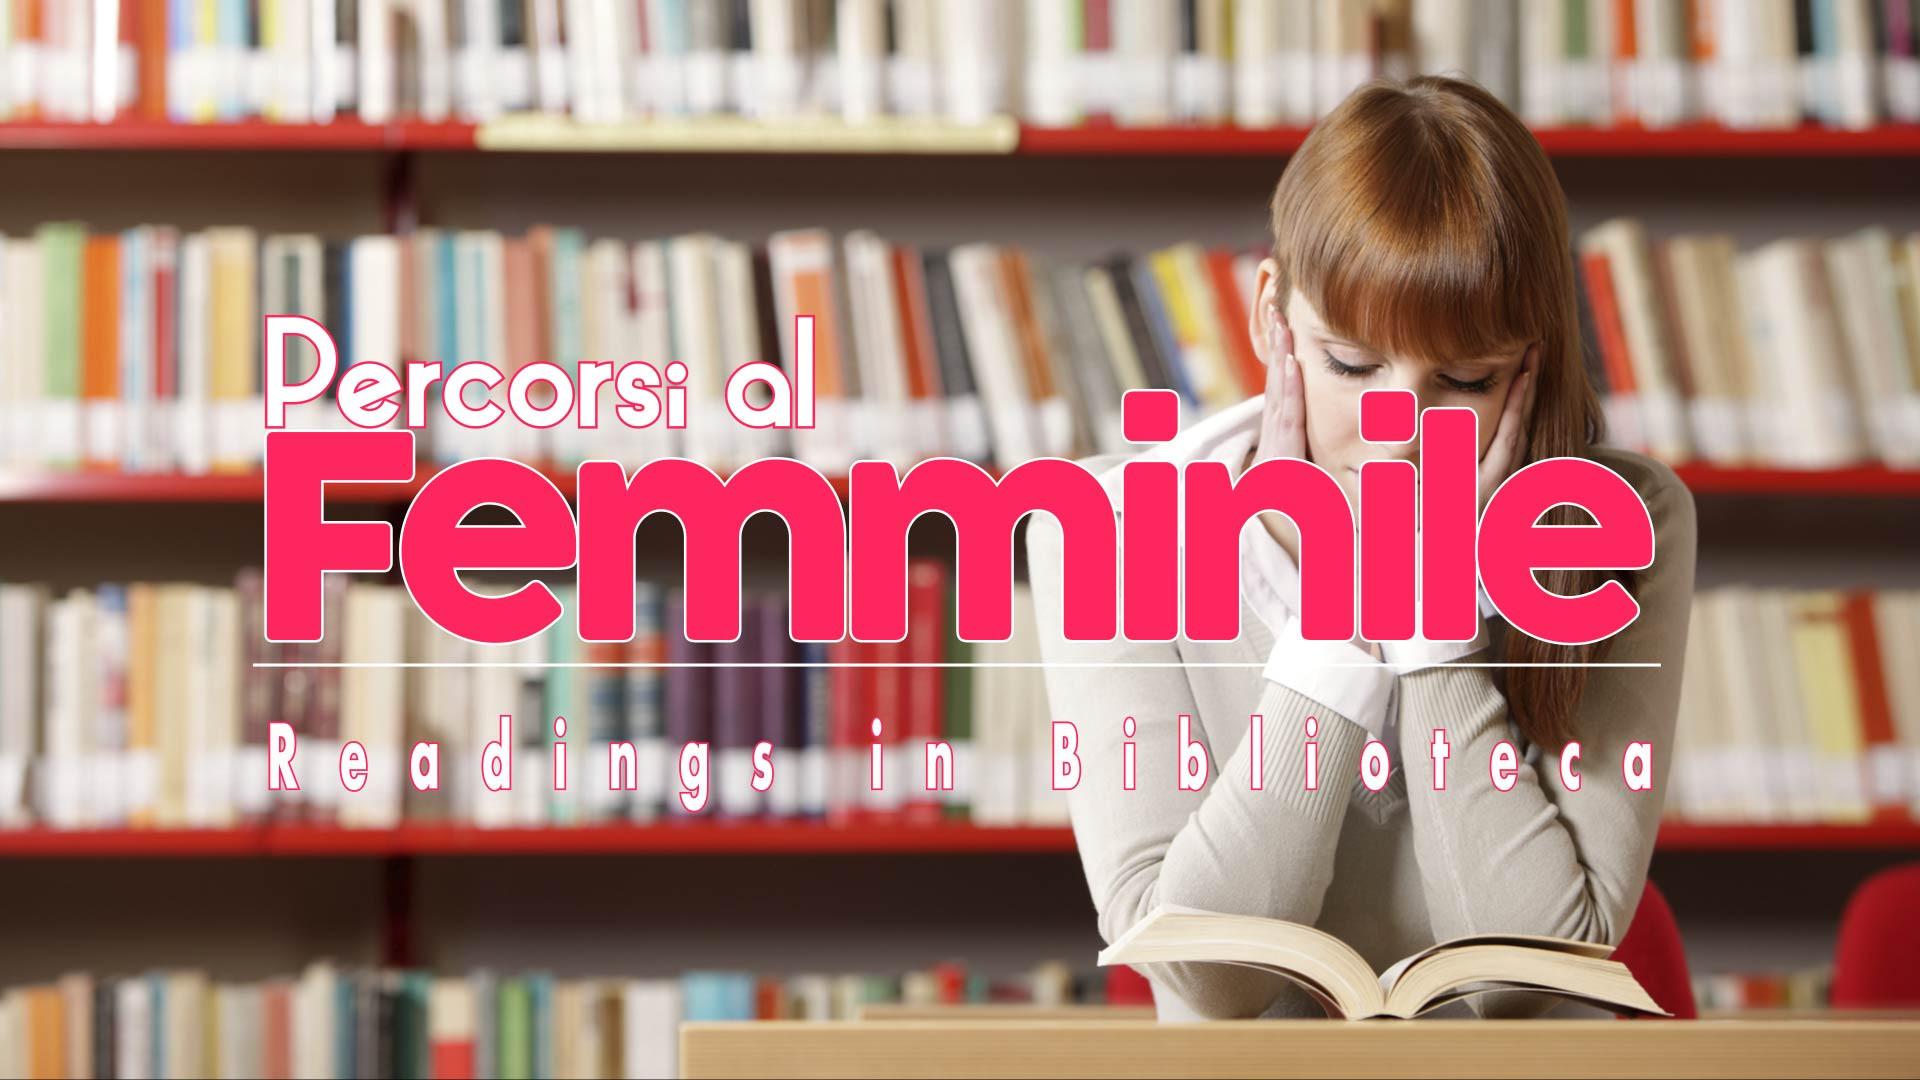 TRAILER - PERCORSI al FEMMINILE READINGS in BIBLIOTECA